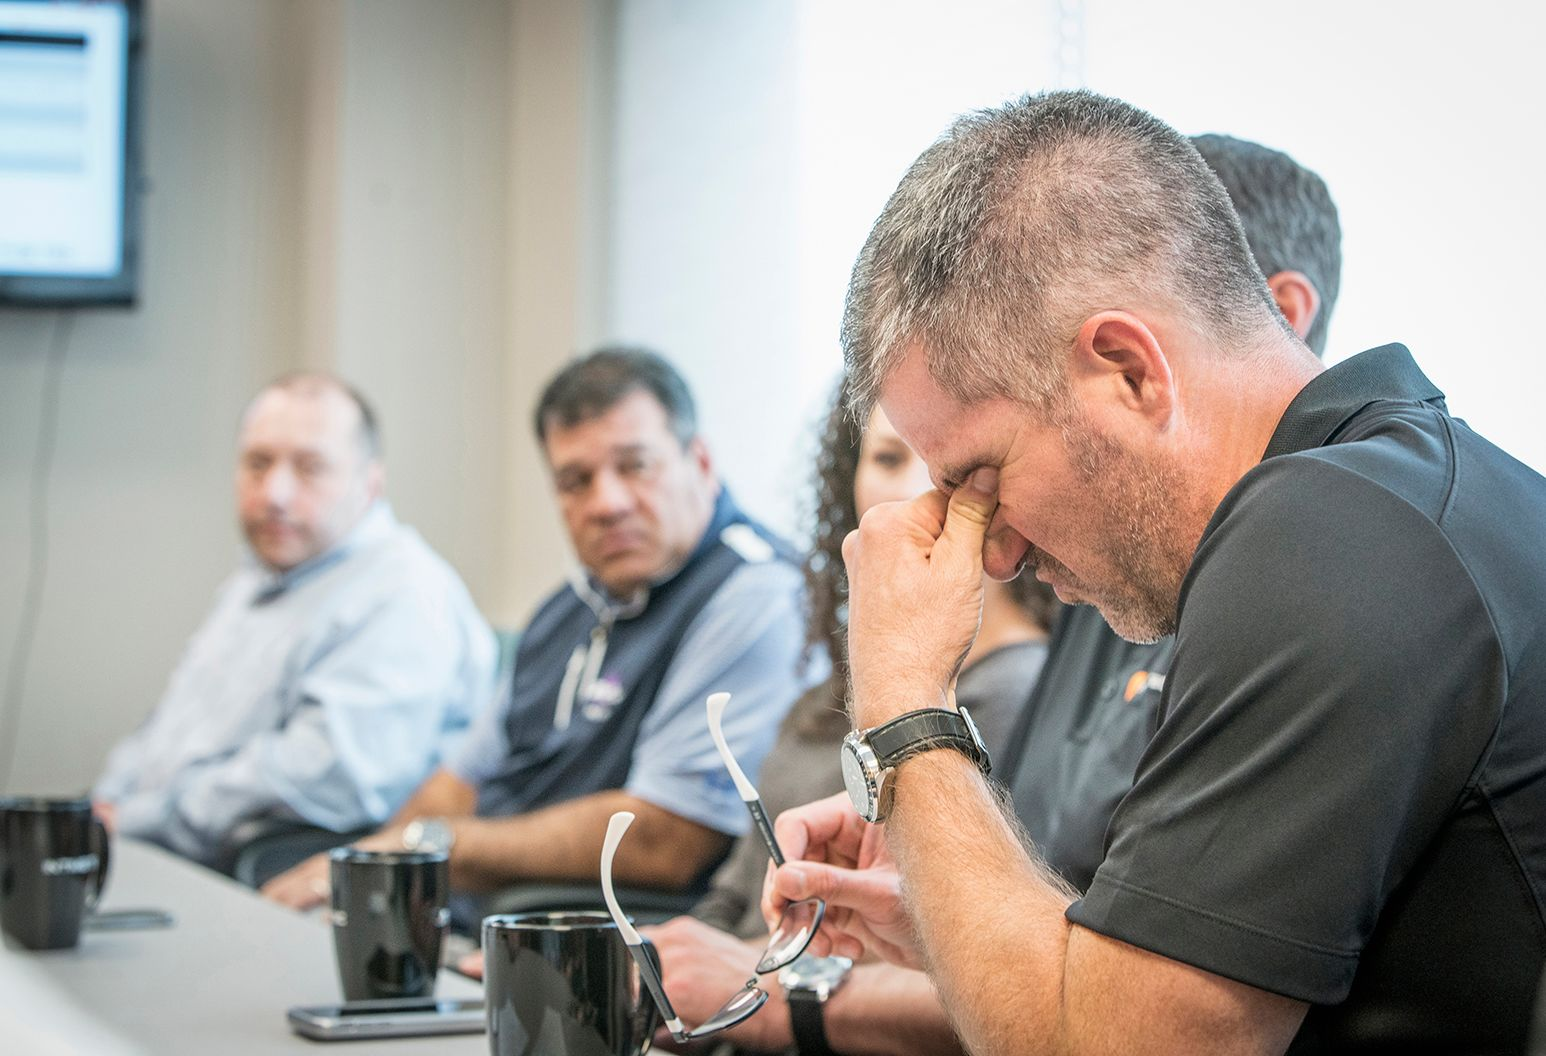 Man struggling to stay awake during a meeting